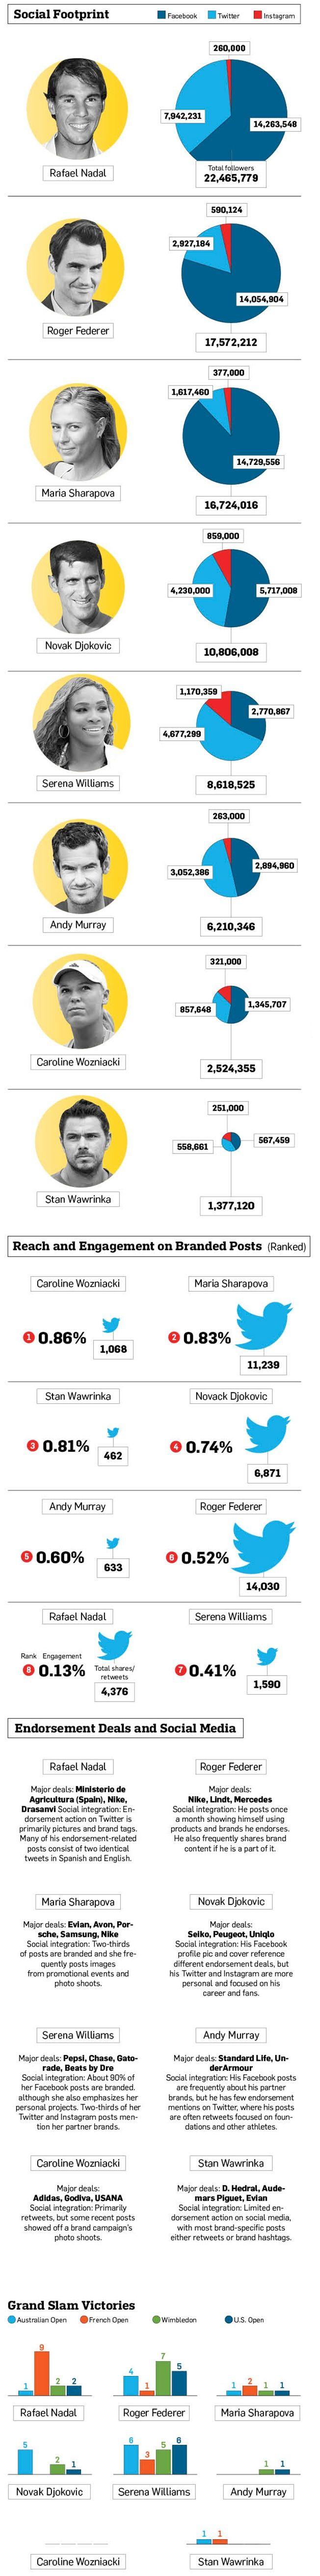 #Tennis #SocialMedia #RafaNadal #RogerFederer #StanWawrinka #MariaSharopova